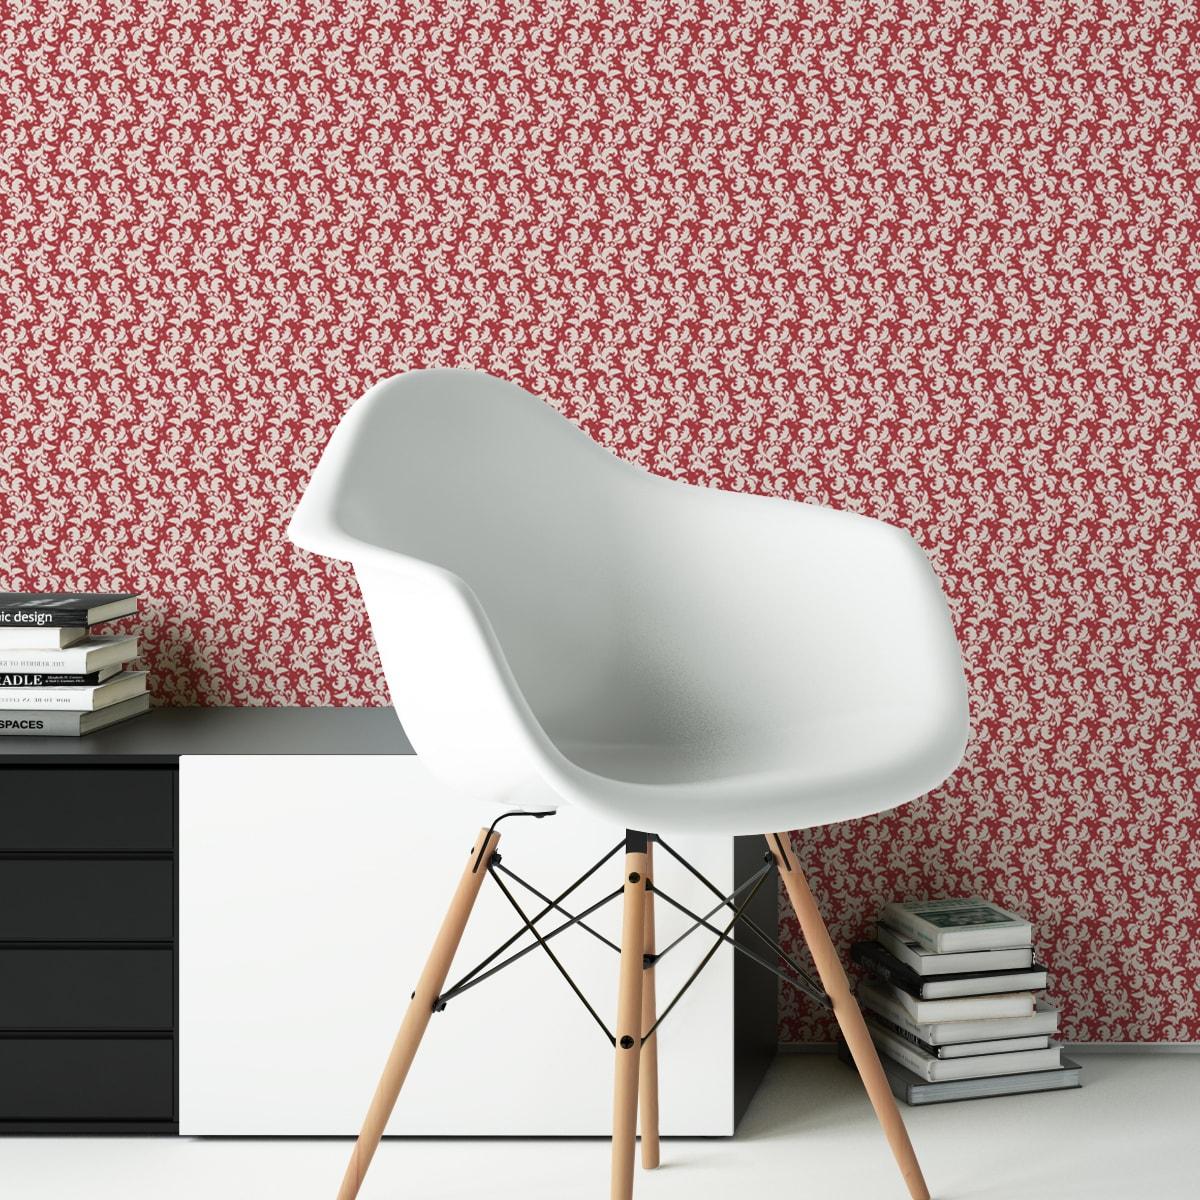 Wandtapete dunkel rot: Rote Ornamenttapete Nostalgie Ranken mit Blatt Muster, Vlies Tapete Ornamente als Wandgestaltung